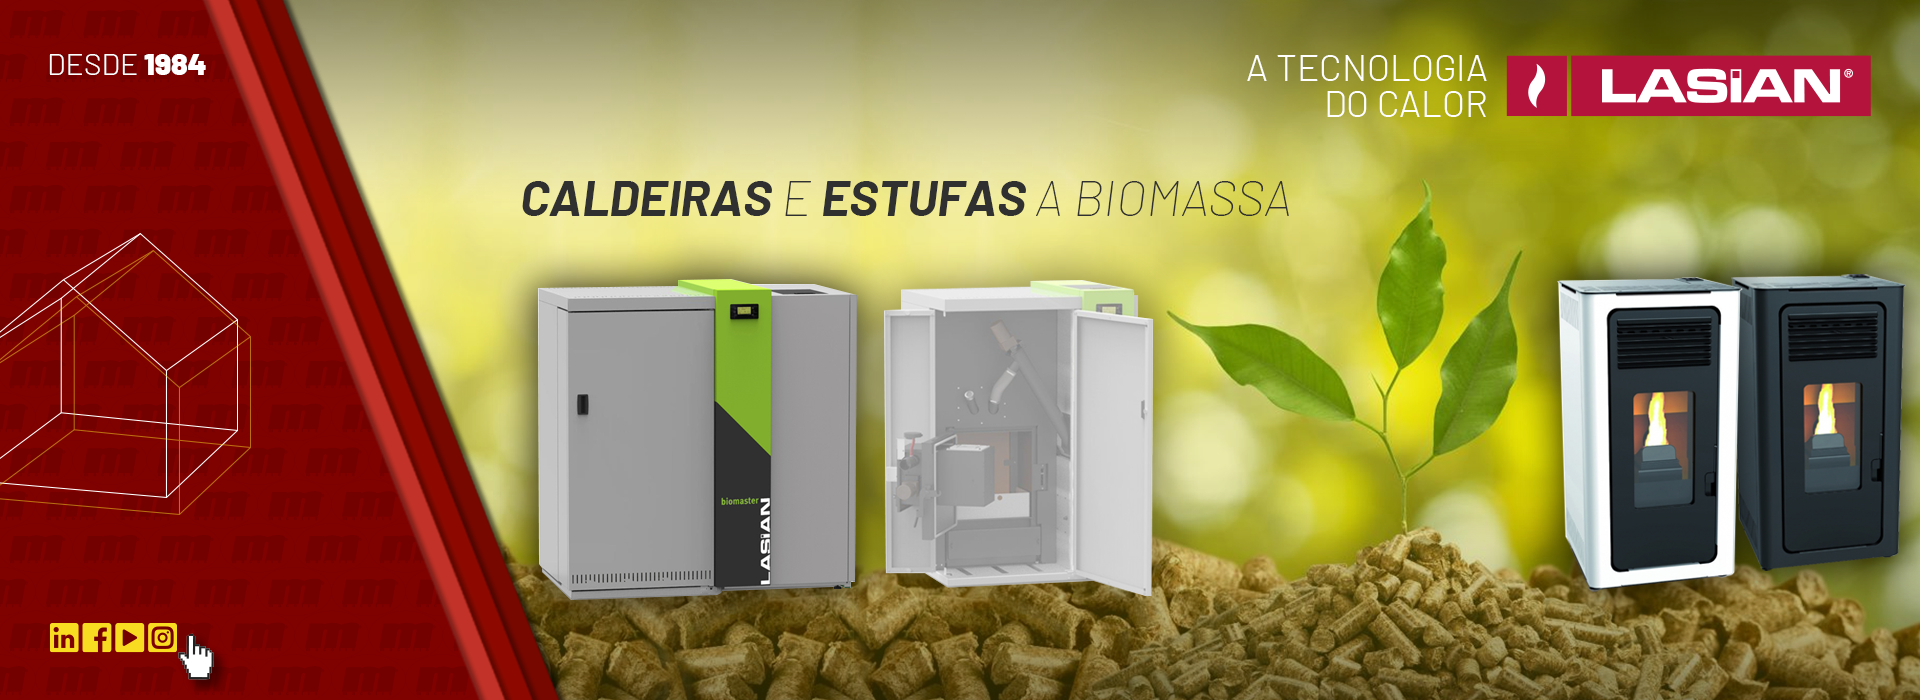 Caldeiras e Estufas Biomassa